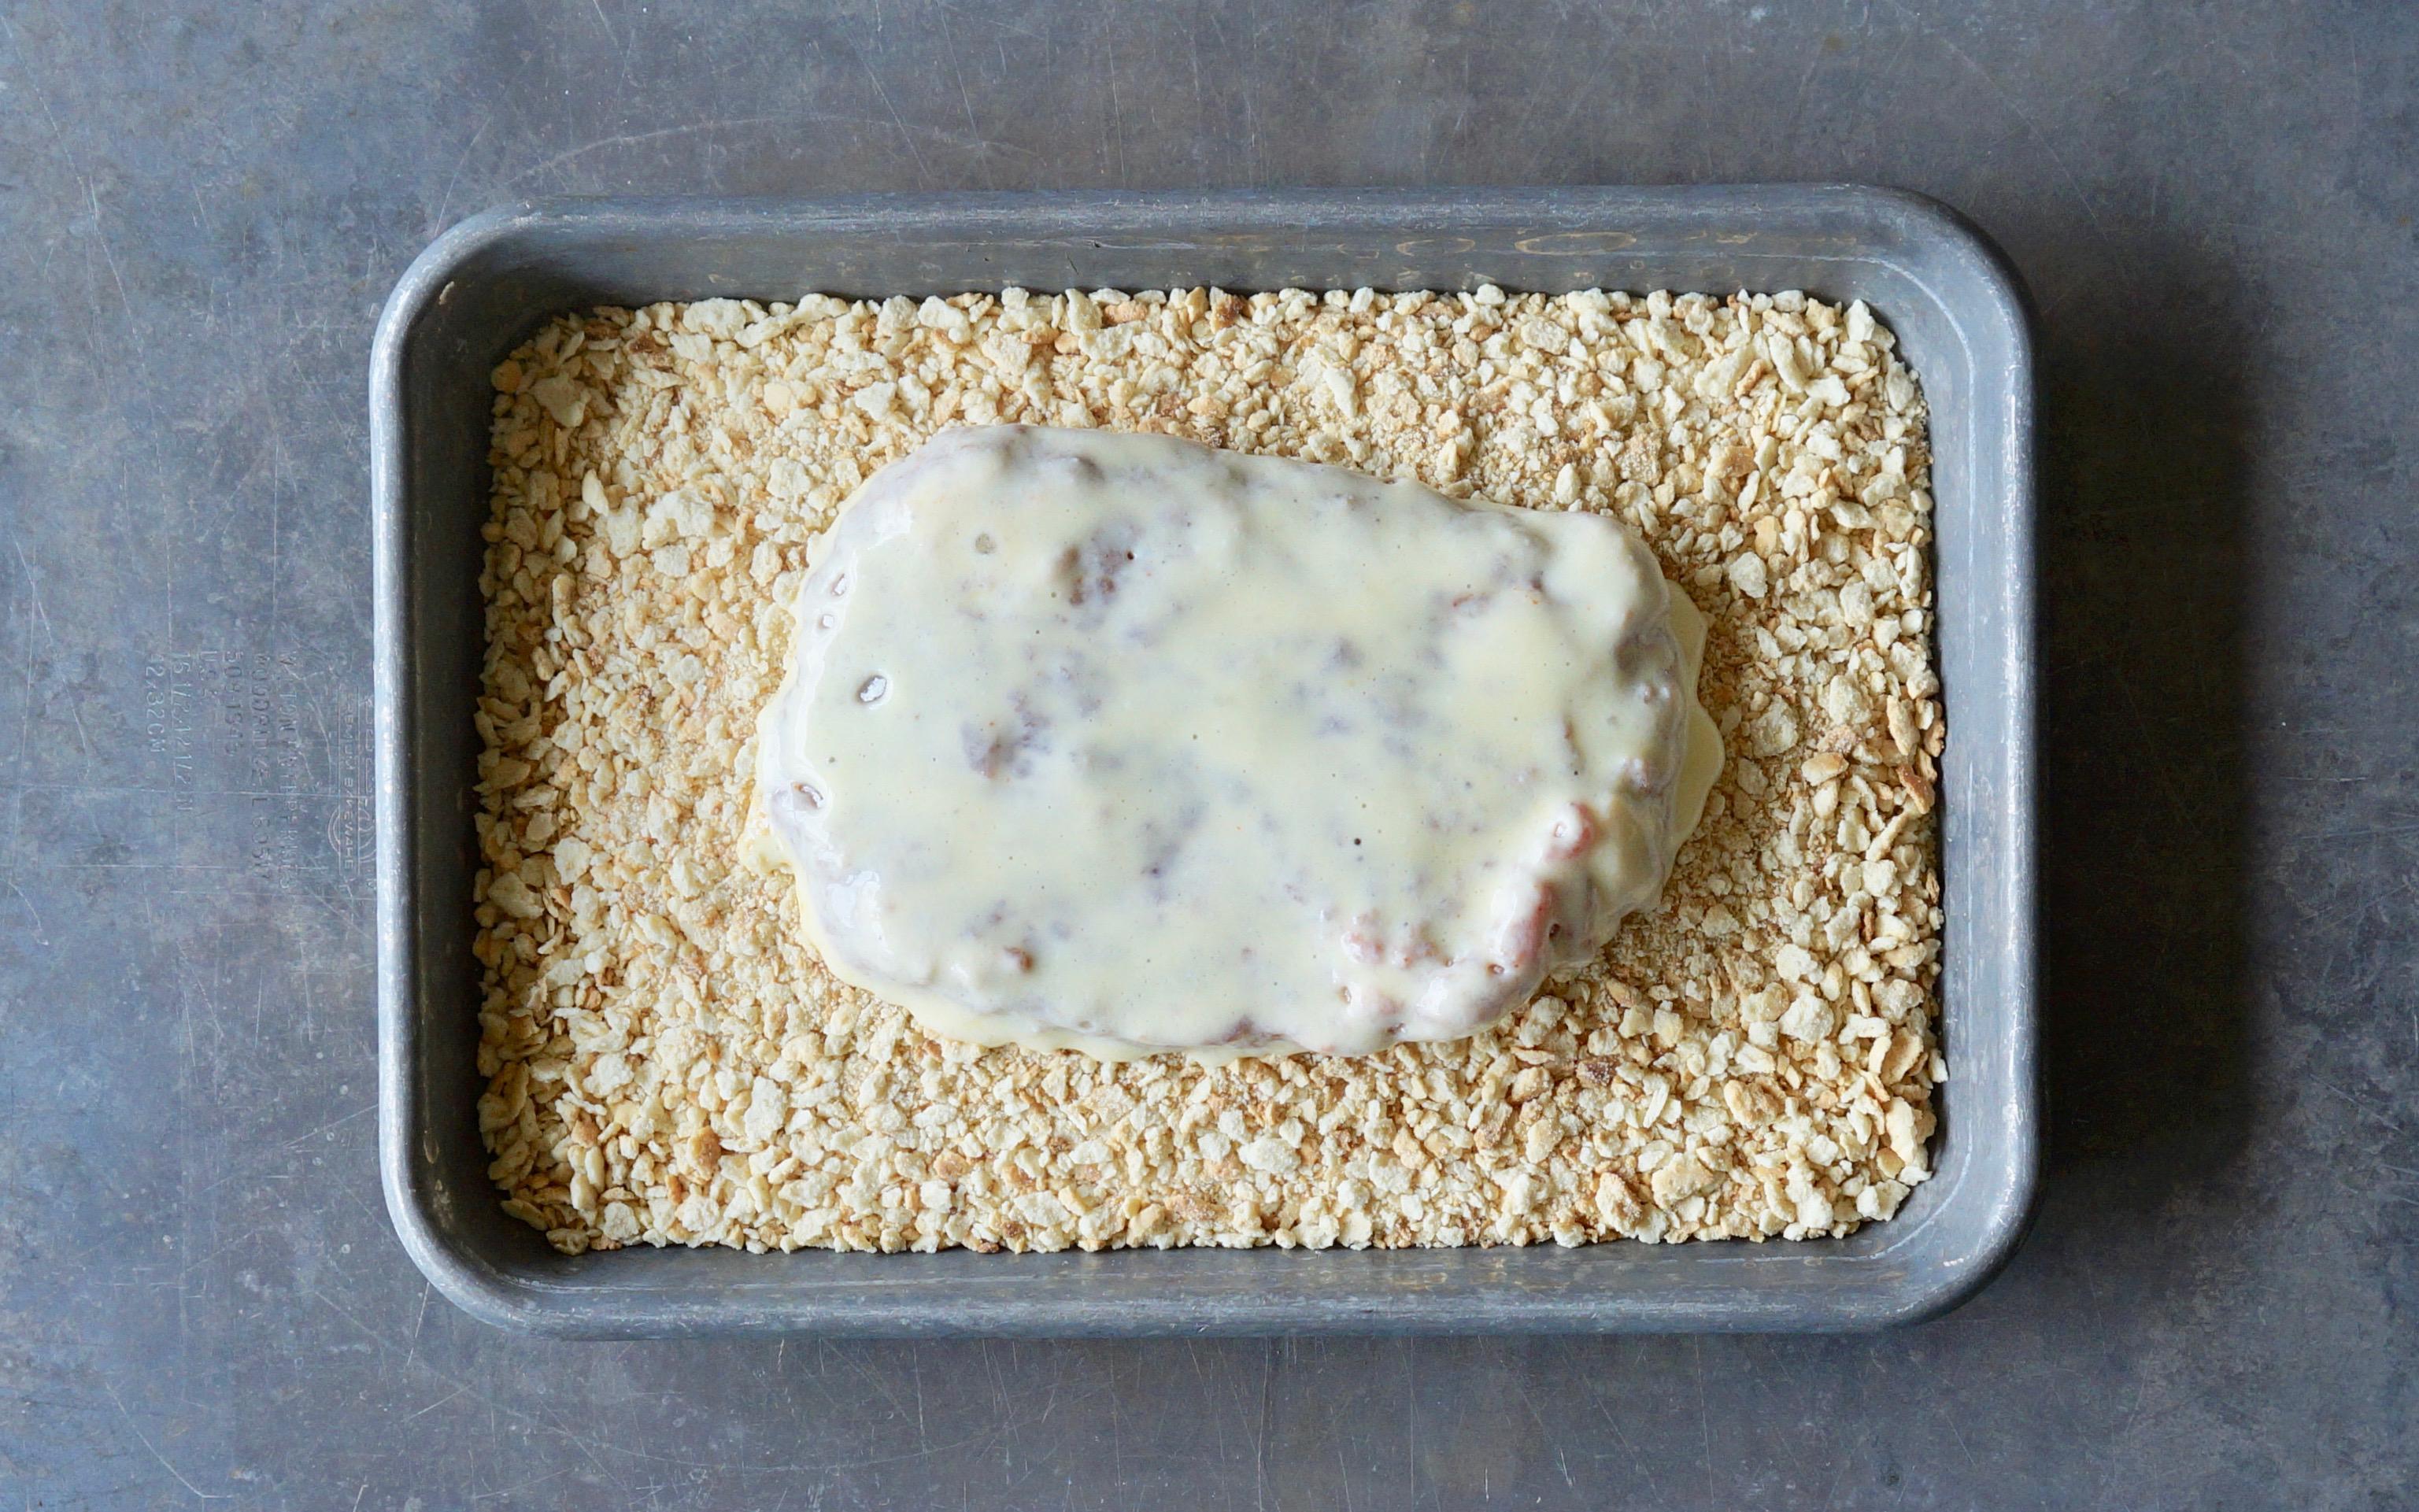 Rebecca-Gordon-Smothered-Chicken-Fried-Steak-Publisher-Buttermilk-Lipstick-Culinary-Entertaining-Technique-Southern-Hostess-RebeccaGordon-Pastry-Chef-Birmingham-Alabama